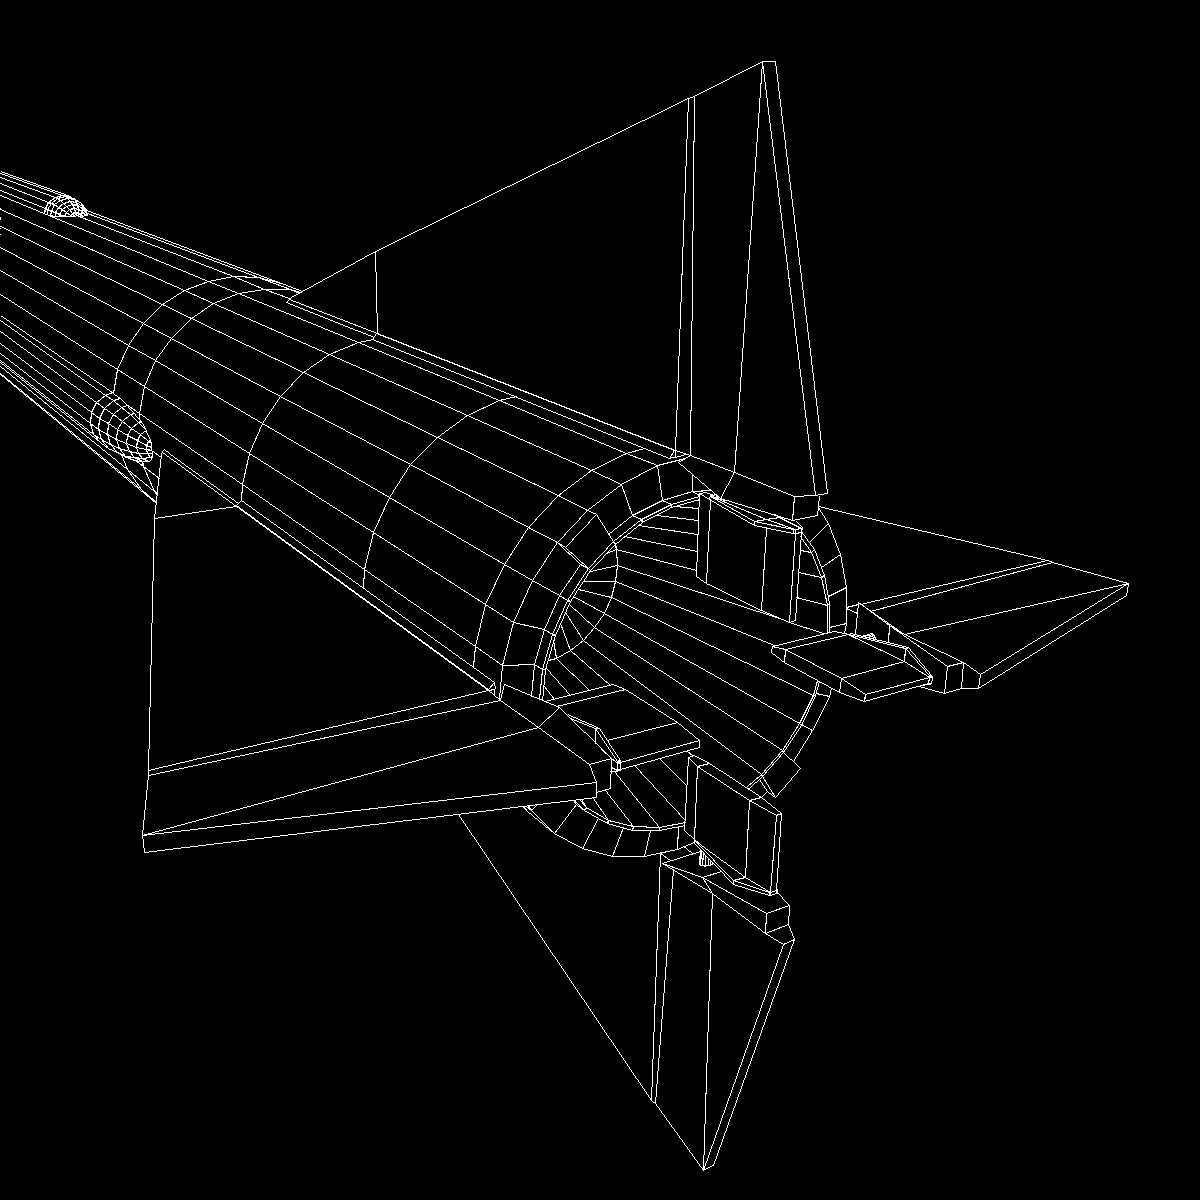 us mgm-5 corporal missile 3d model 3ds dxf x cod scn obj 149920